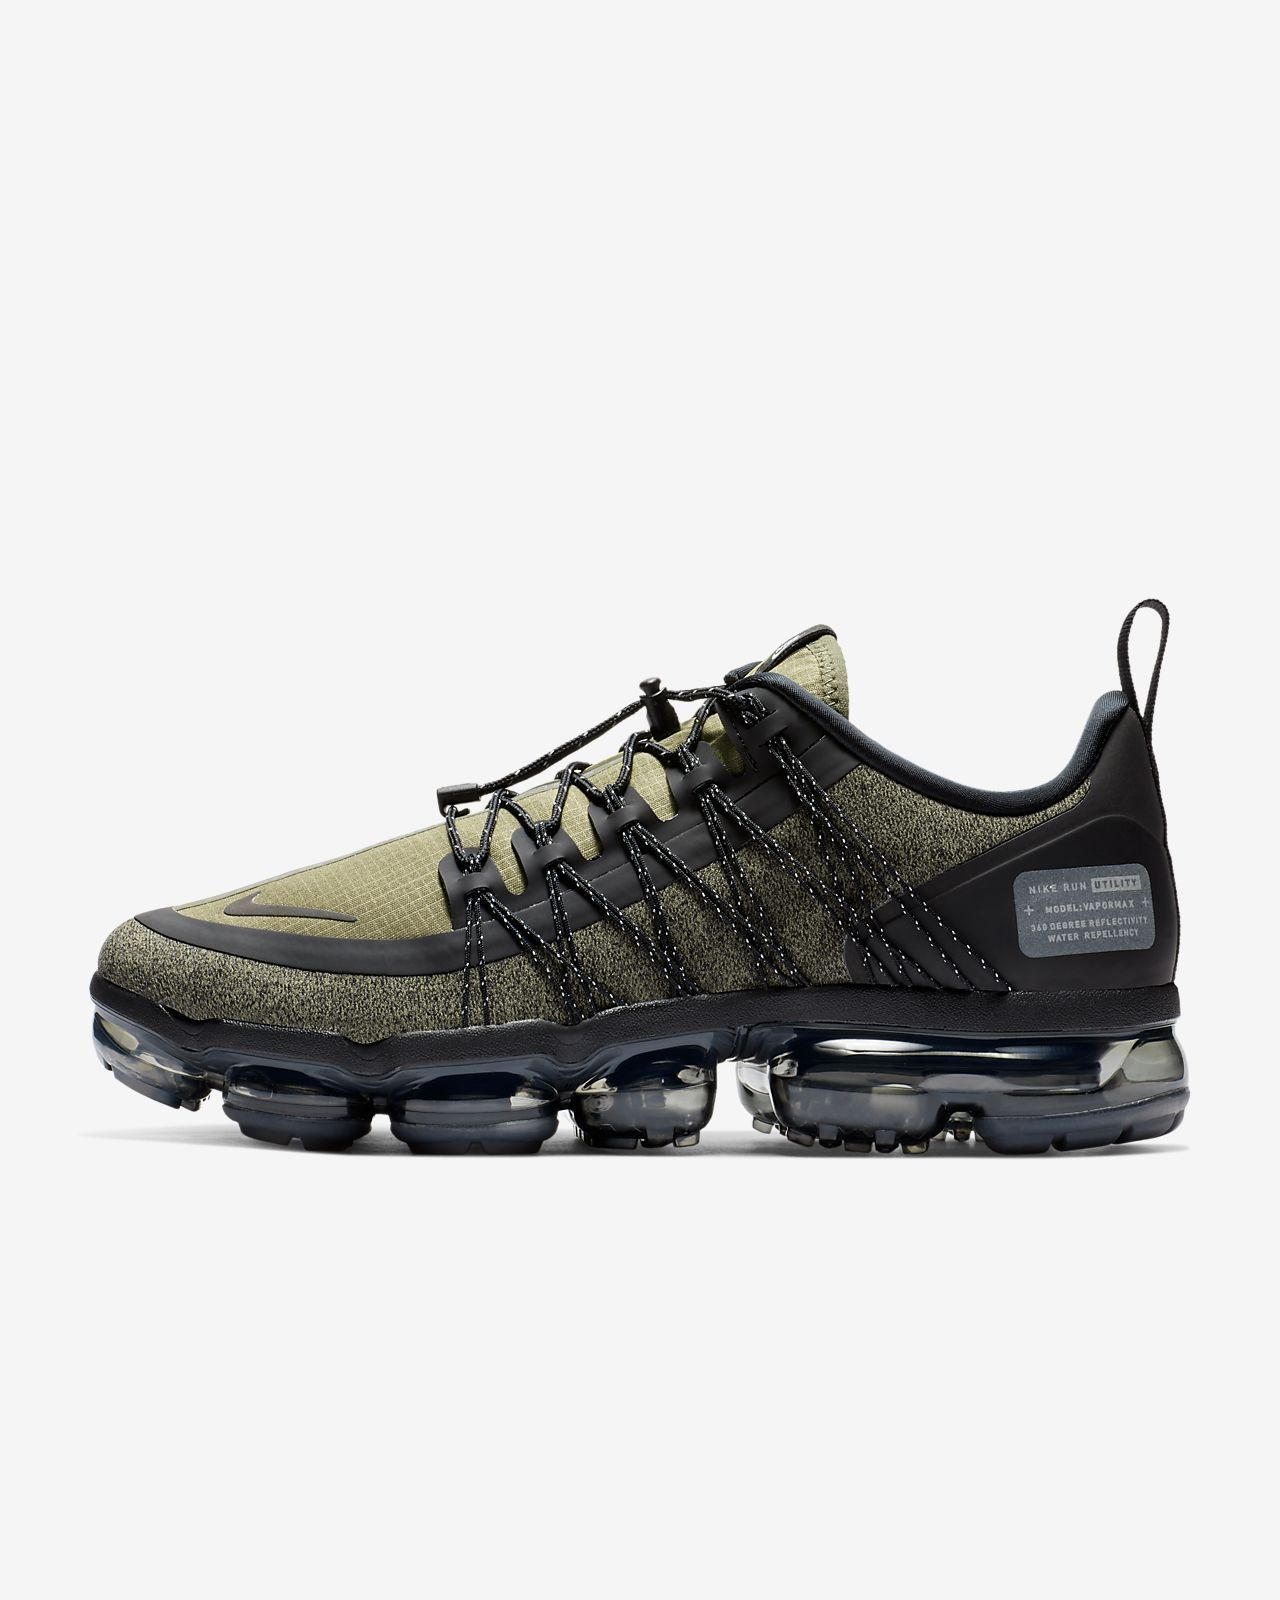 984c4bdabe9 Air VaporMax Utility Men s Shoe in 2019